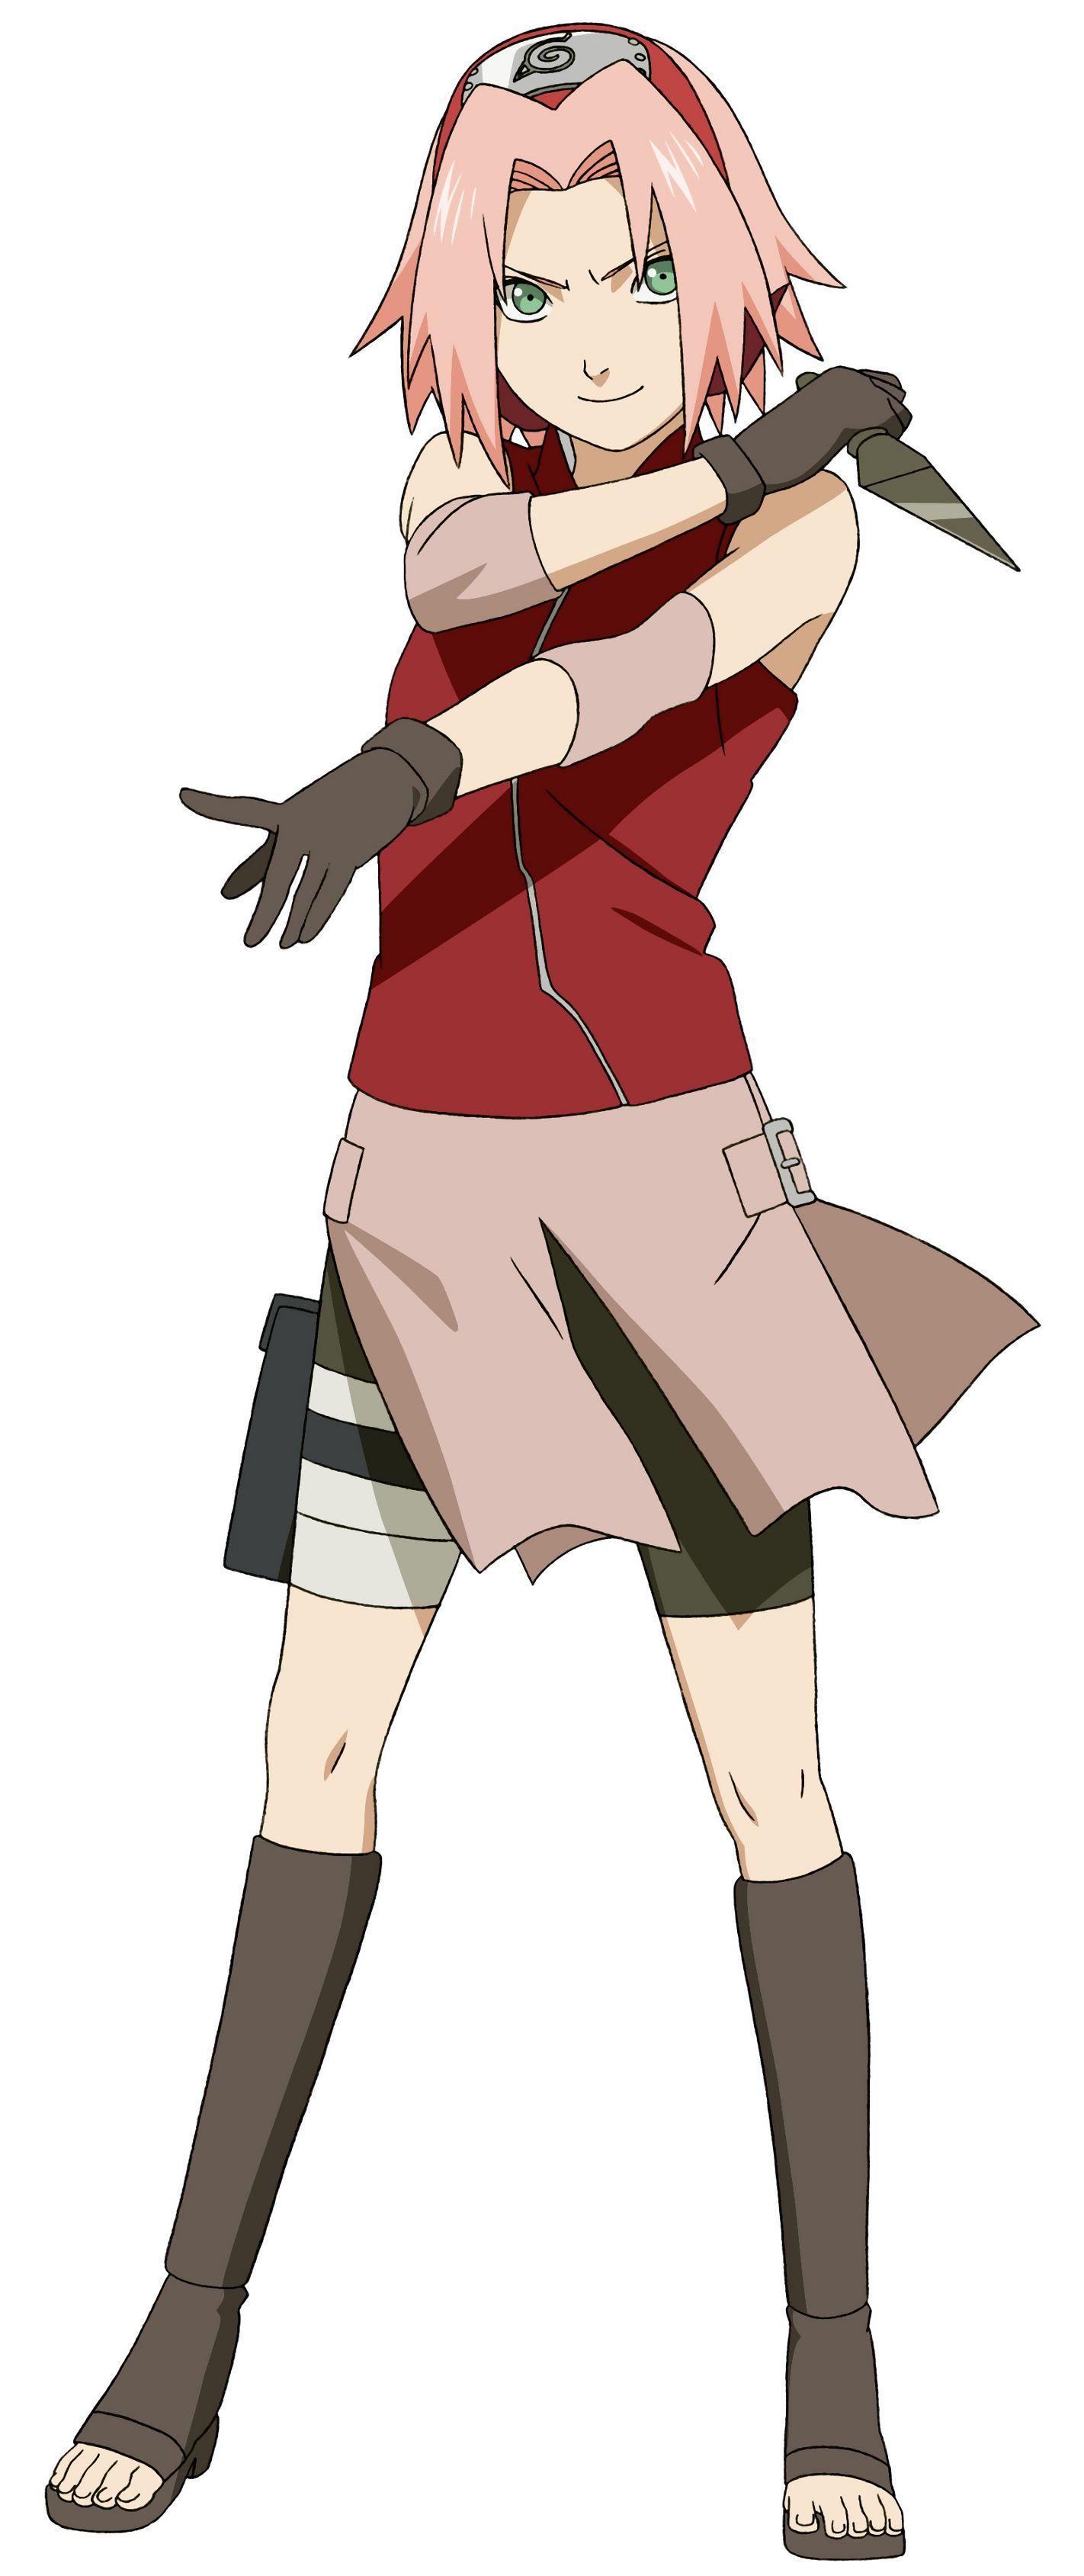 Sakura Haruno Deviantart Animasi Gambar Anime